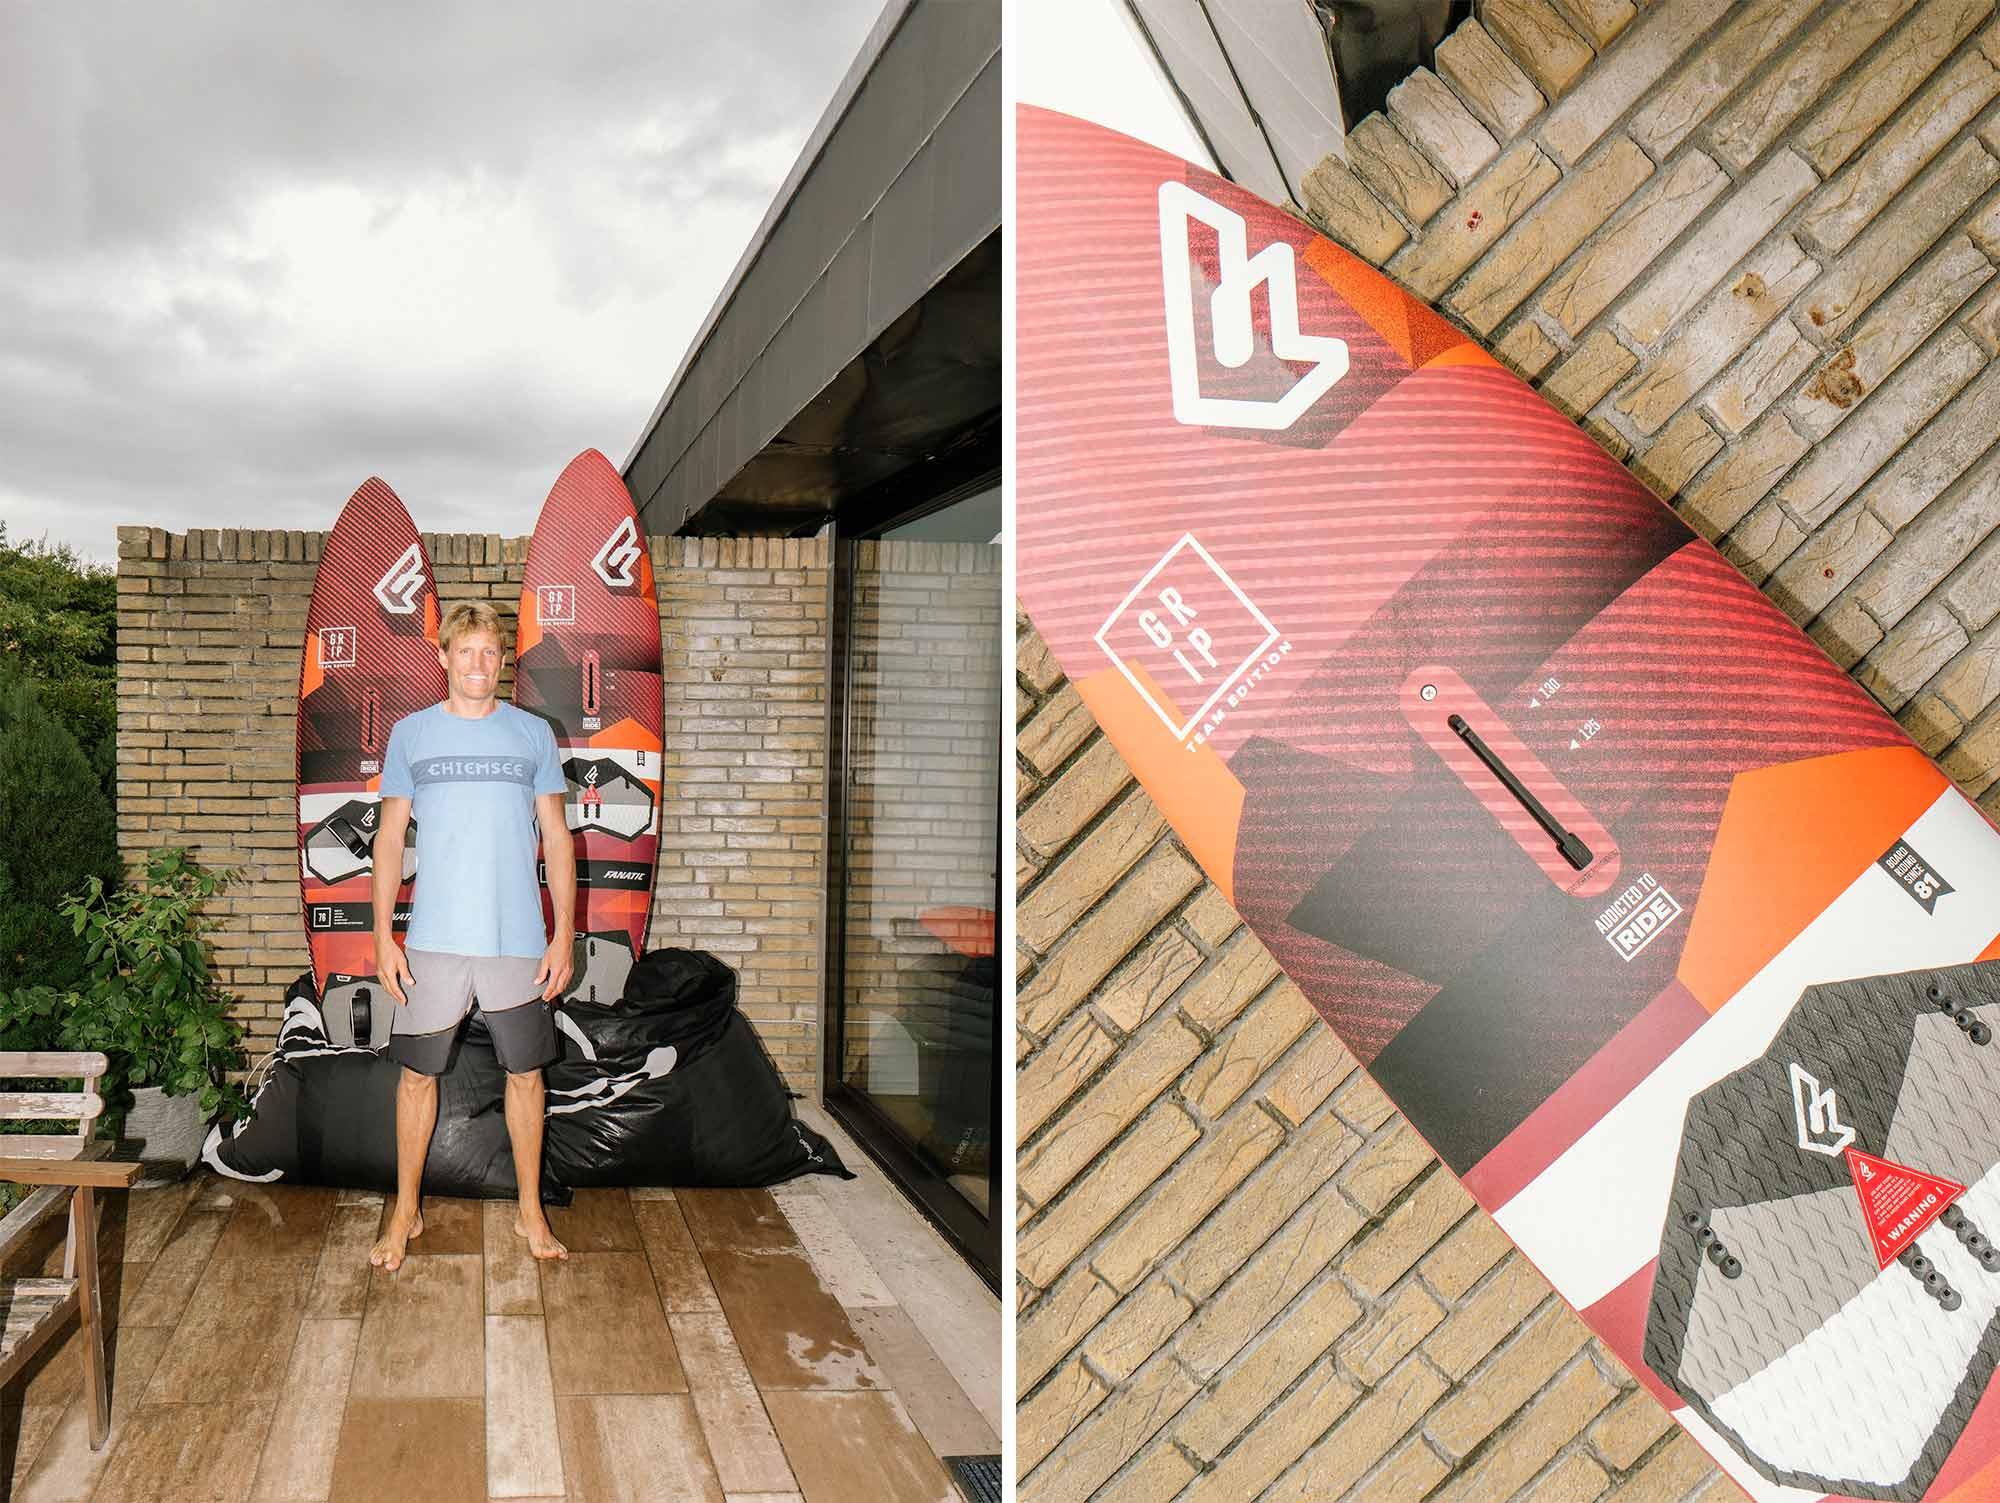 18-klaas-voget-surfboard